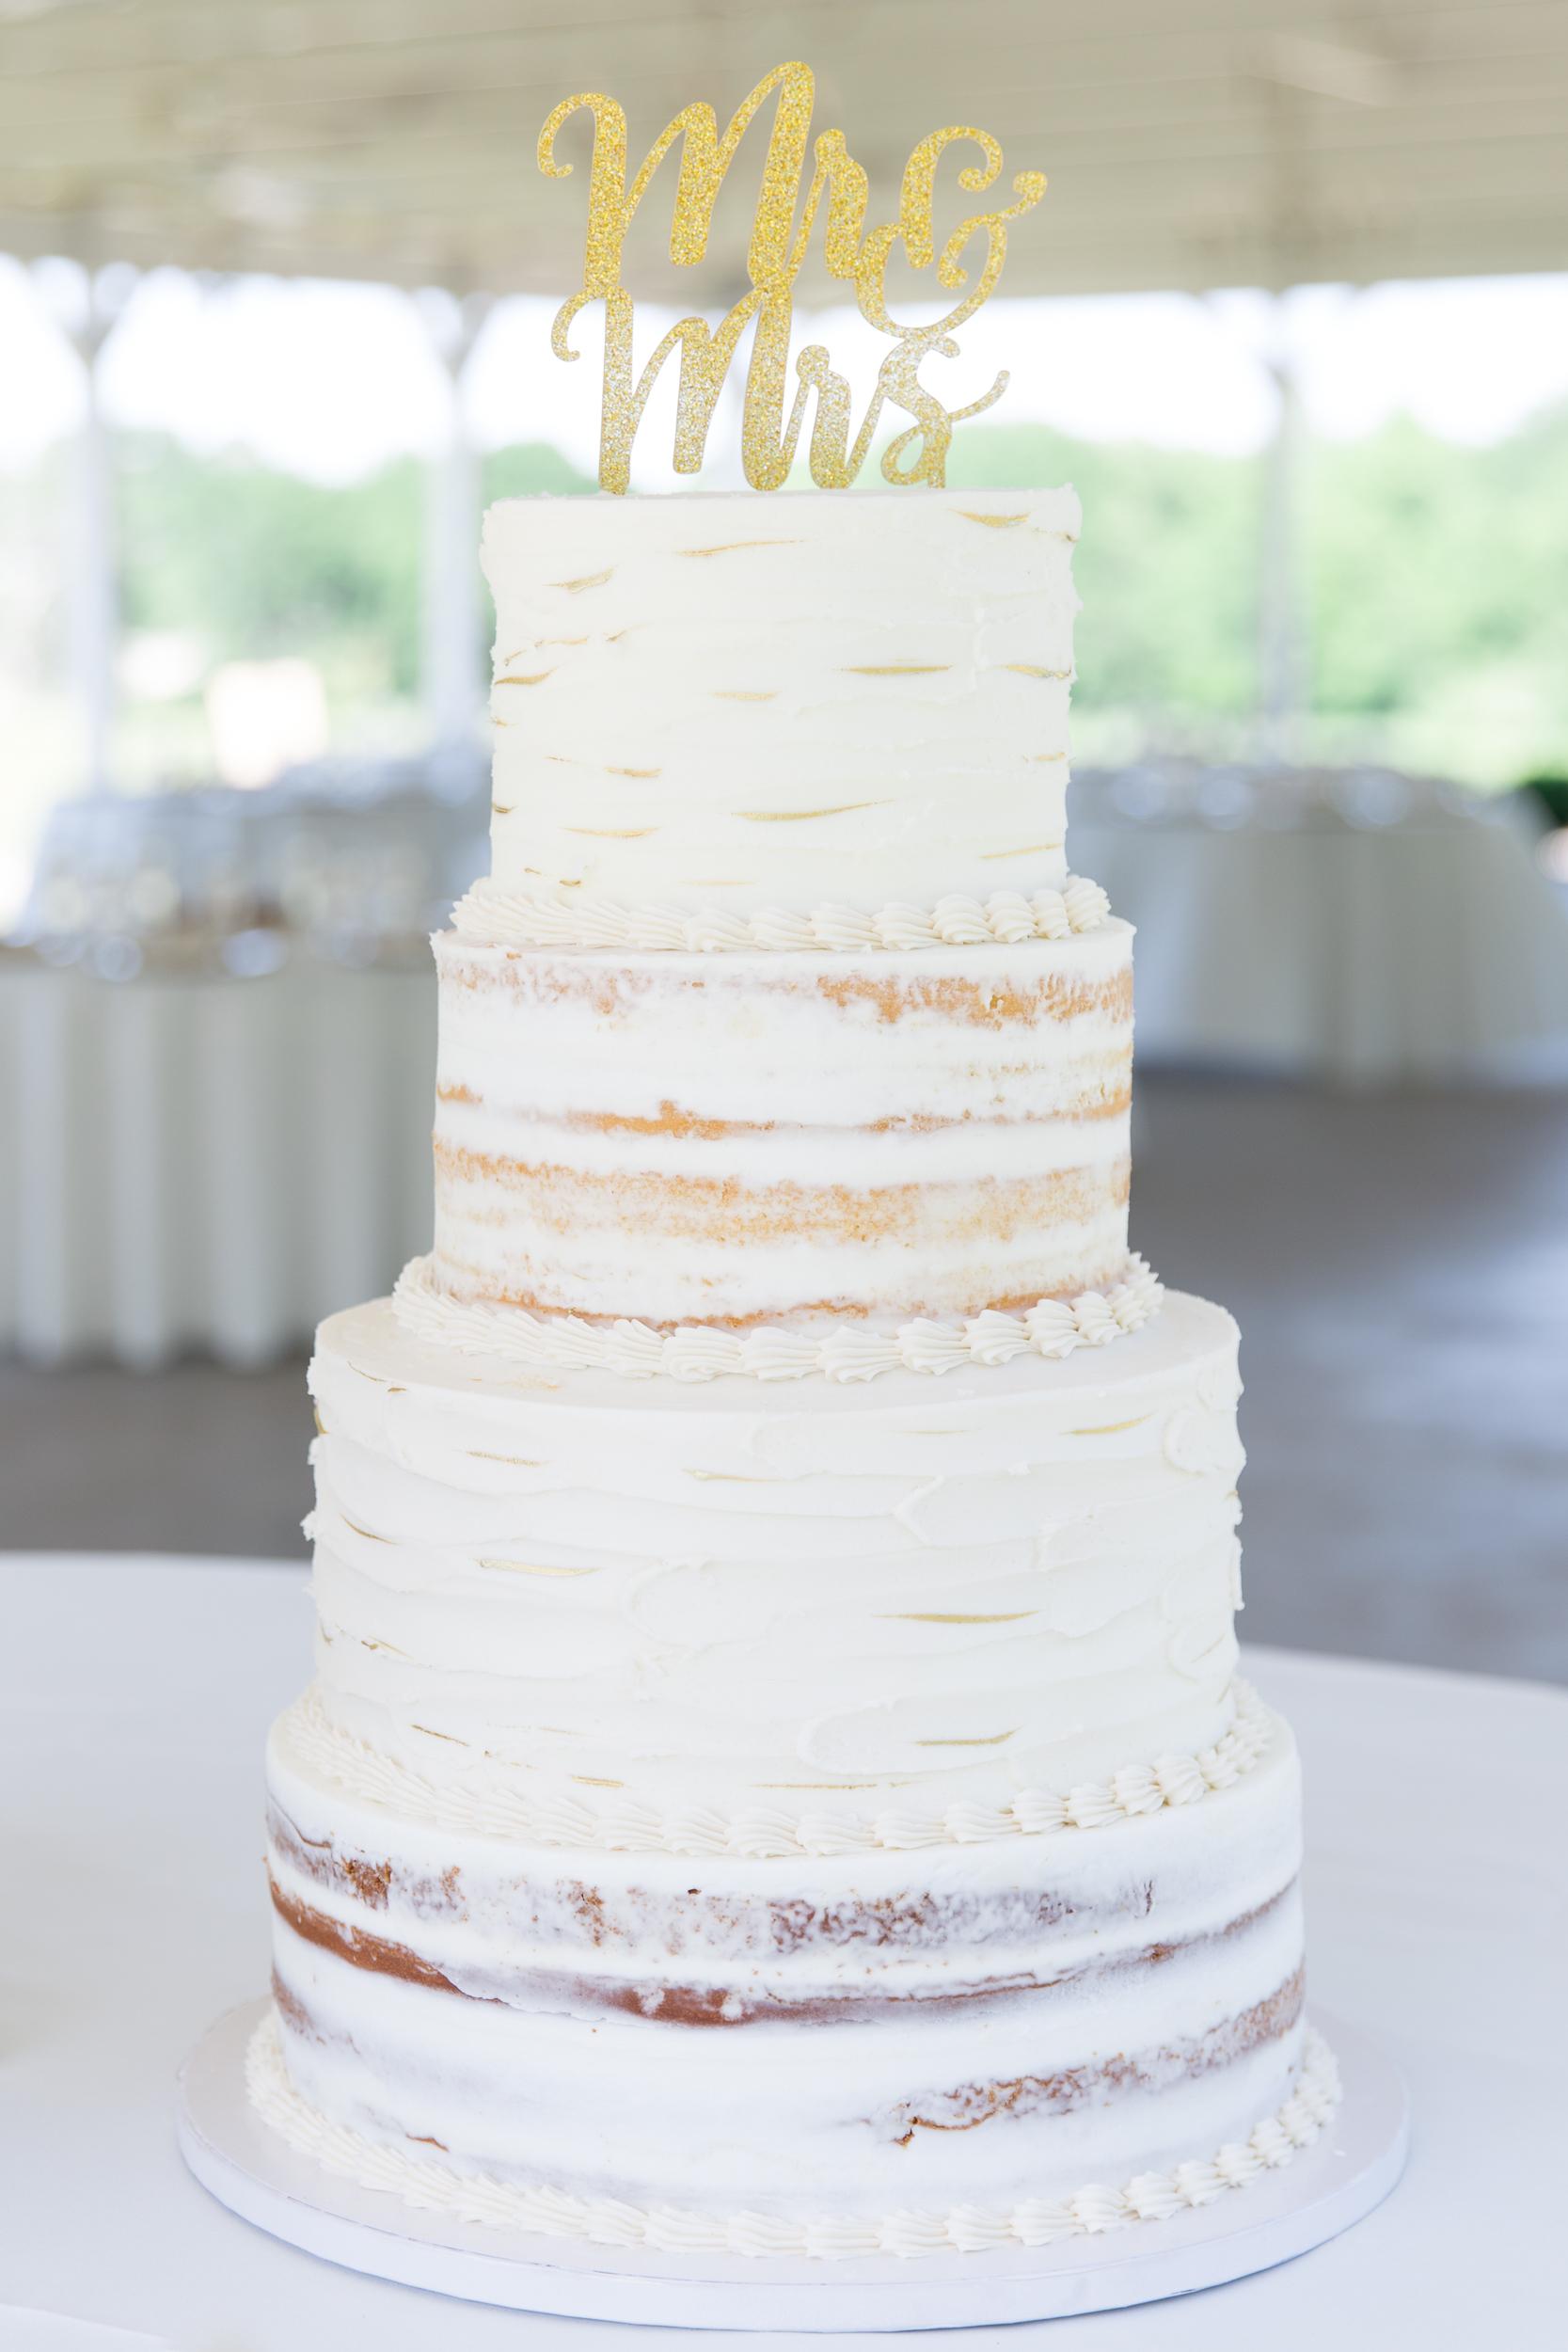 Zihlman-East TX Wedding_Kelsie Hendricks Photography_The Folmar Tyler Texas-30.jpg